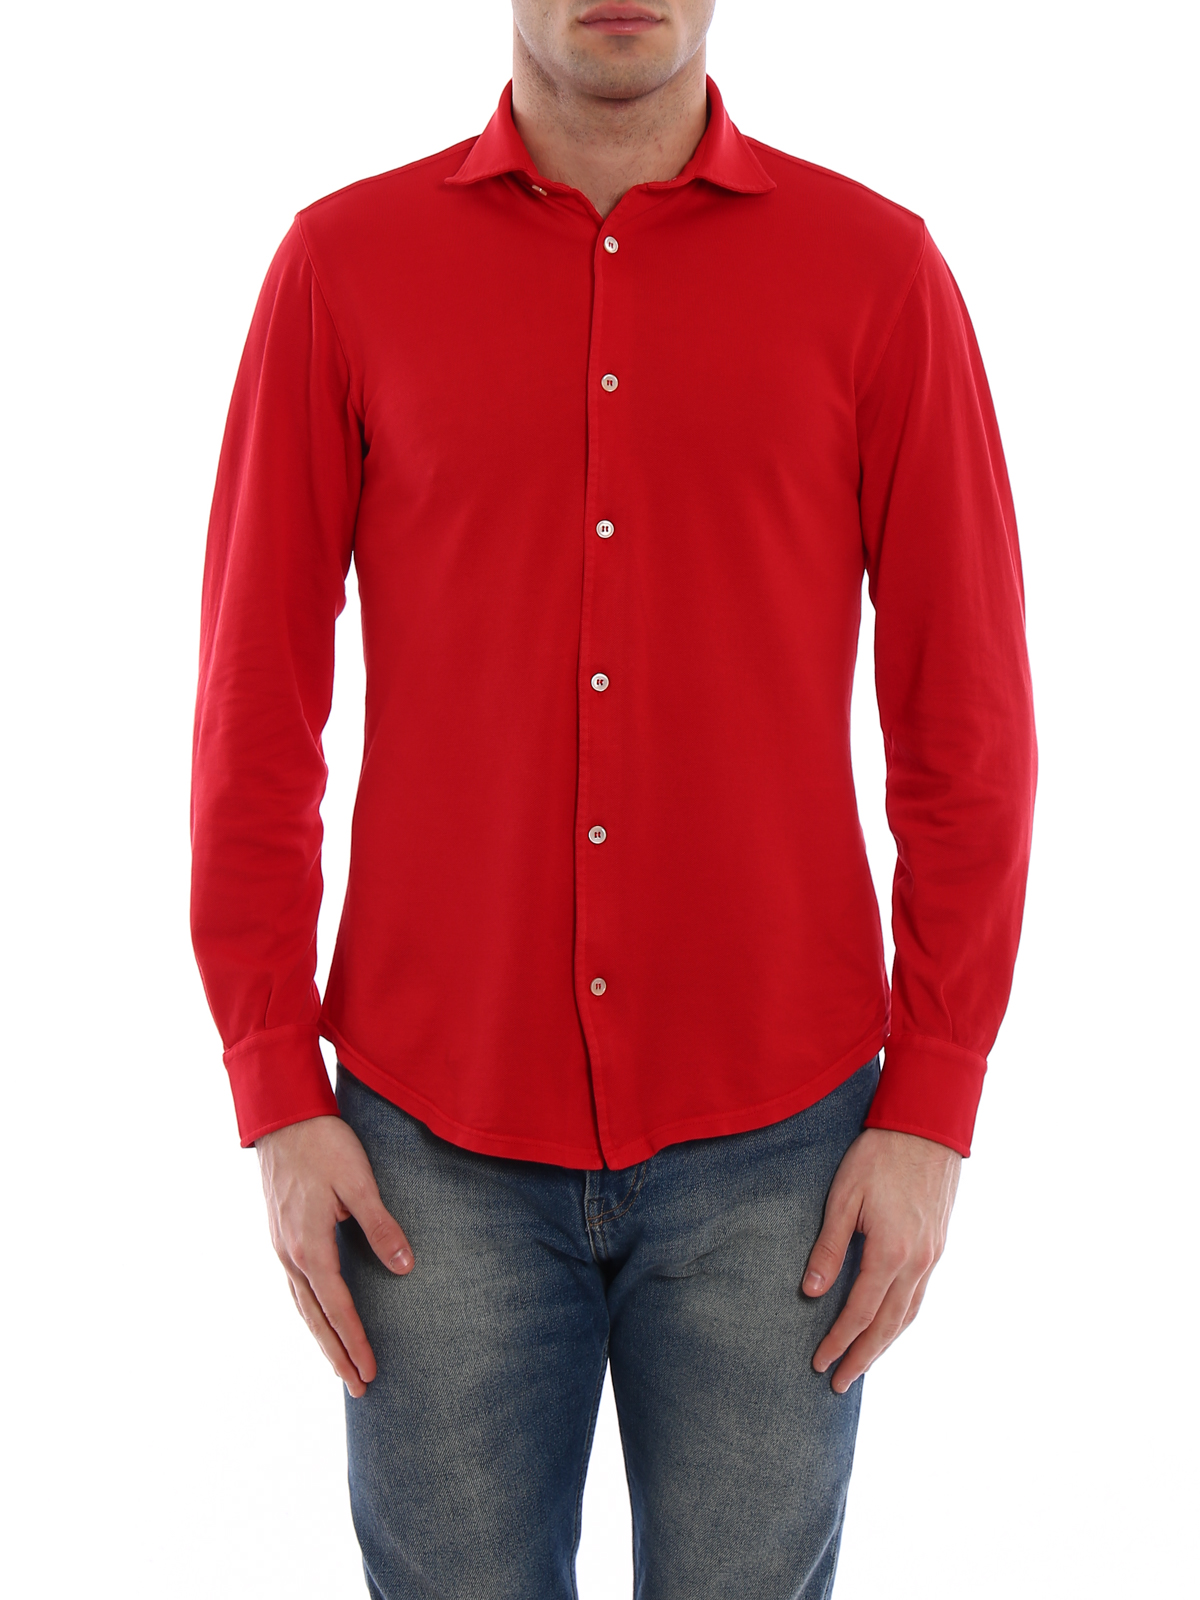 Fedeli Long Sleeves Red Polo Shirt Polo Shirts Fe1ue00101825p18